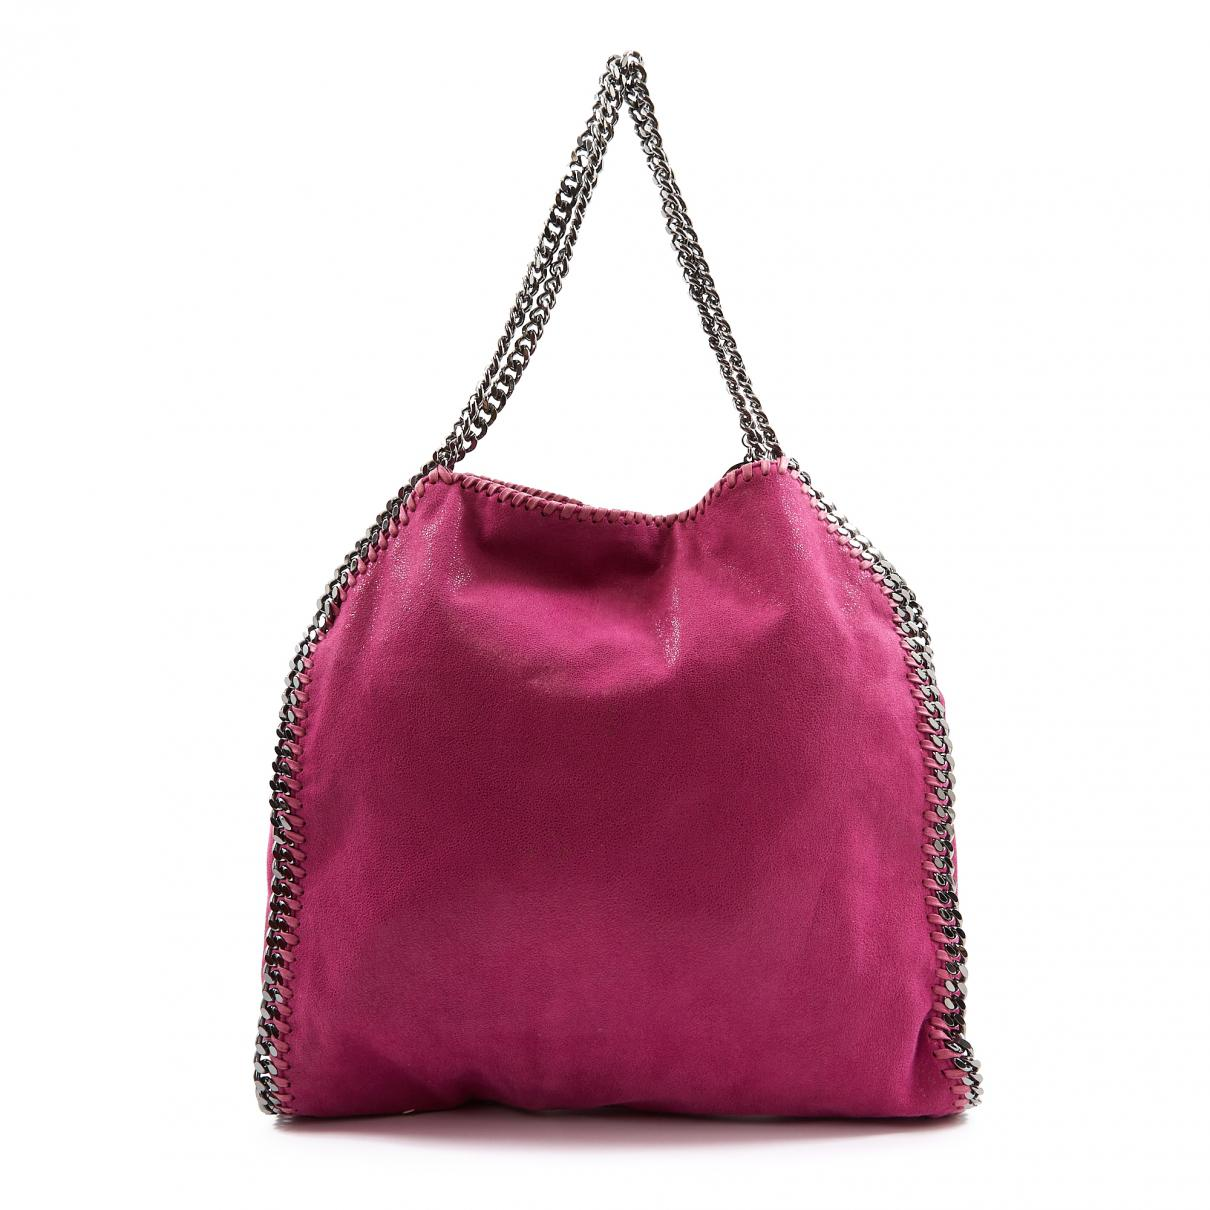 847464630d5d Lyst - Stella Mccartney Falabella Pink Polyester Handbag in Pink